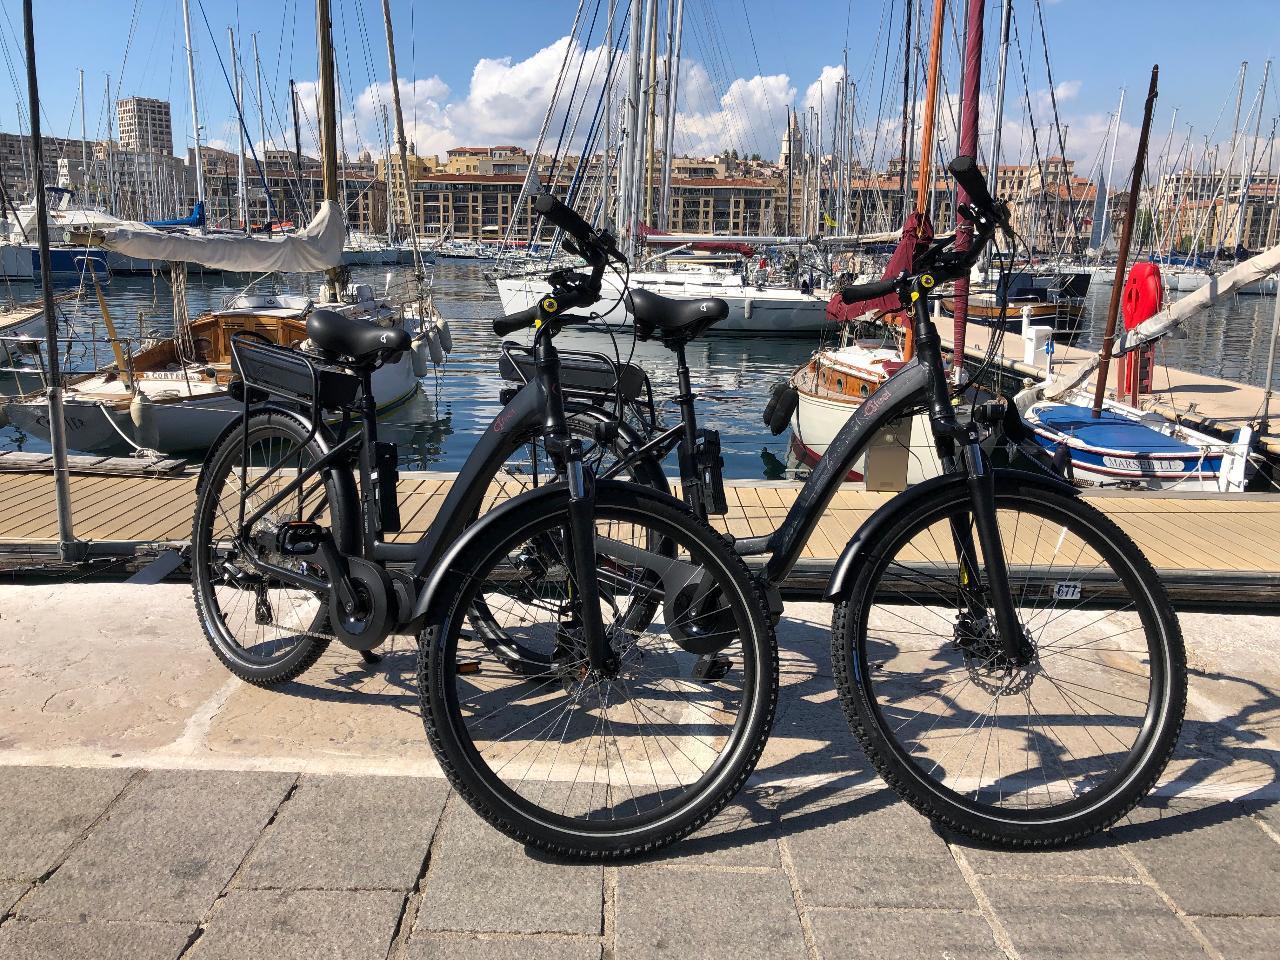 Location velo electrique demi journee - Cassis - Half-day E-bike rental